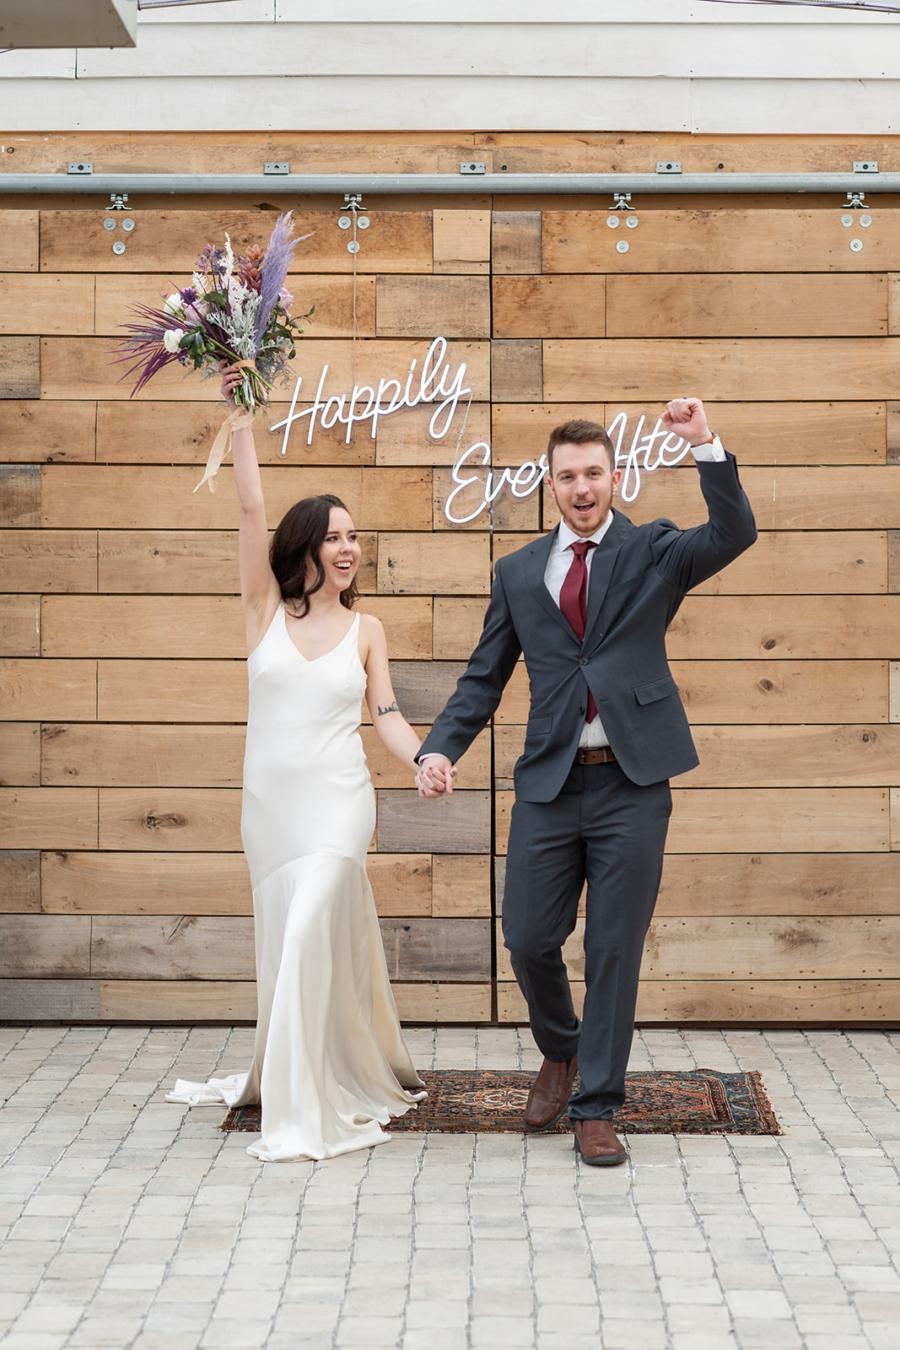 Long Hollow Gardens wedding ceremony inspiration